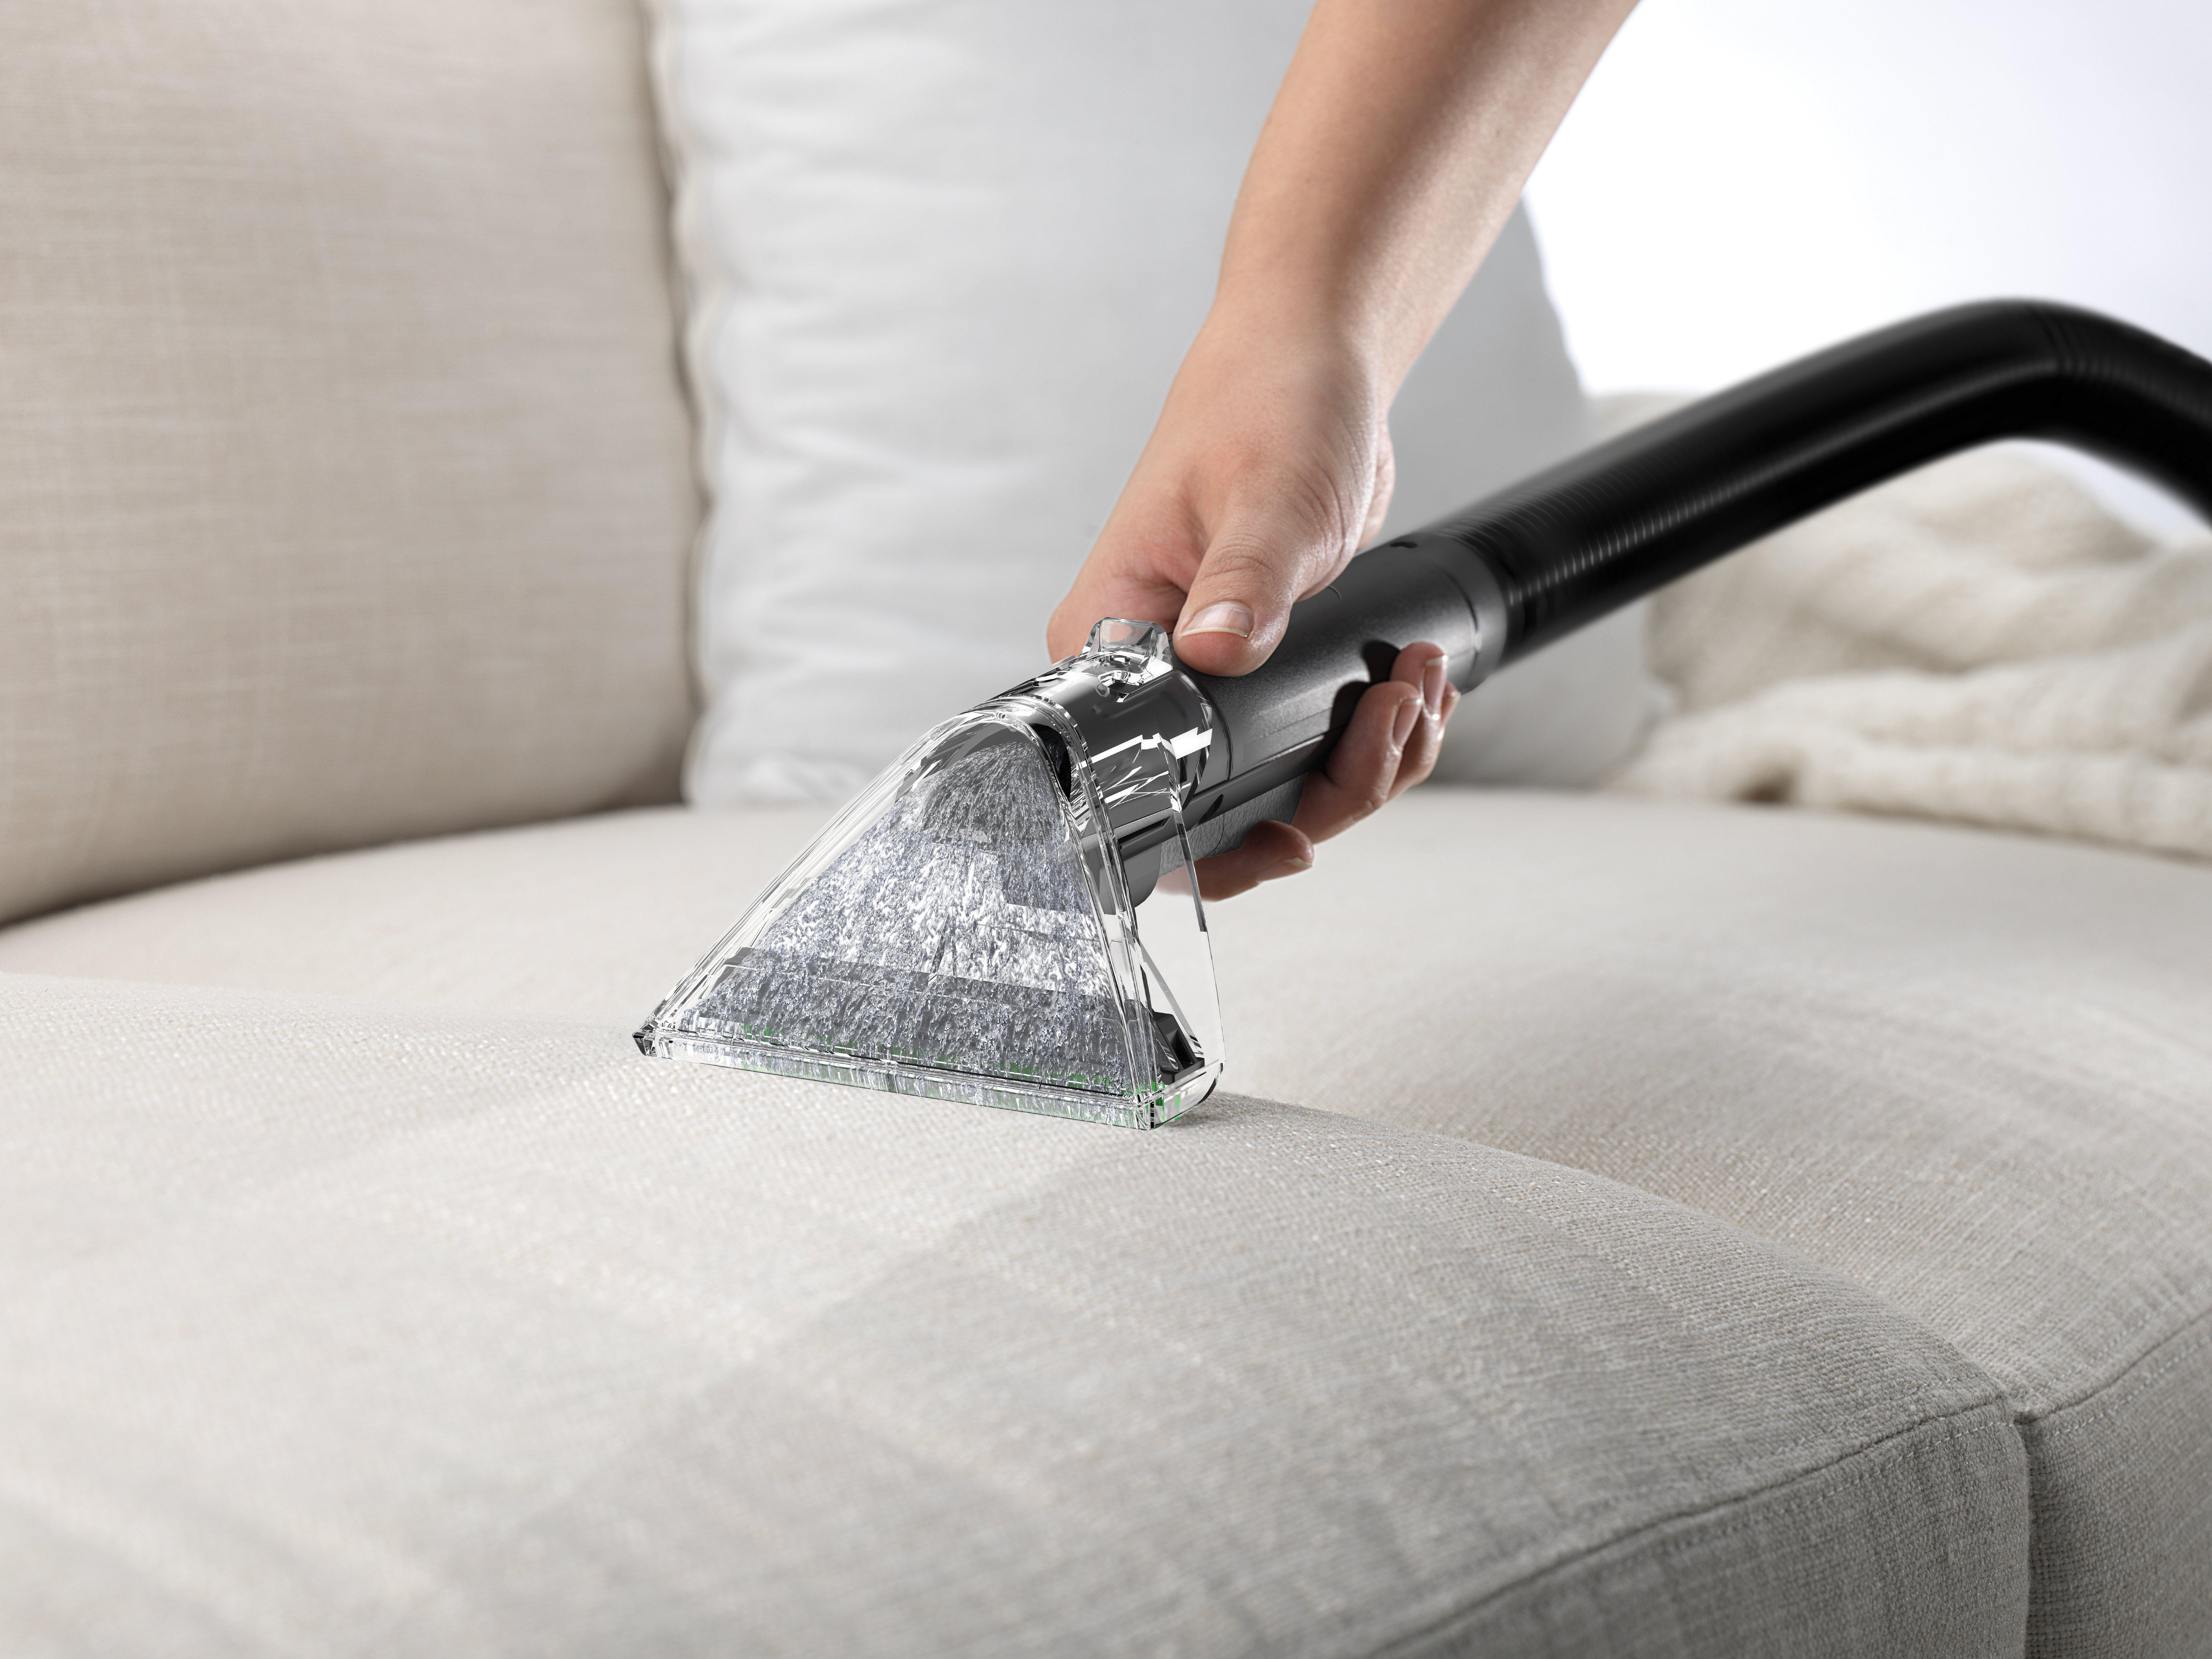 Hoover® Power Scrub Deluxe Carpet Cleaner6